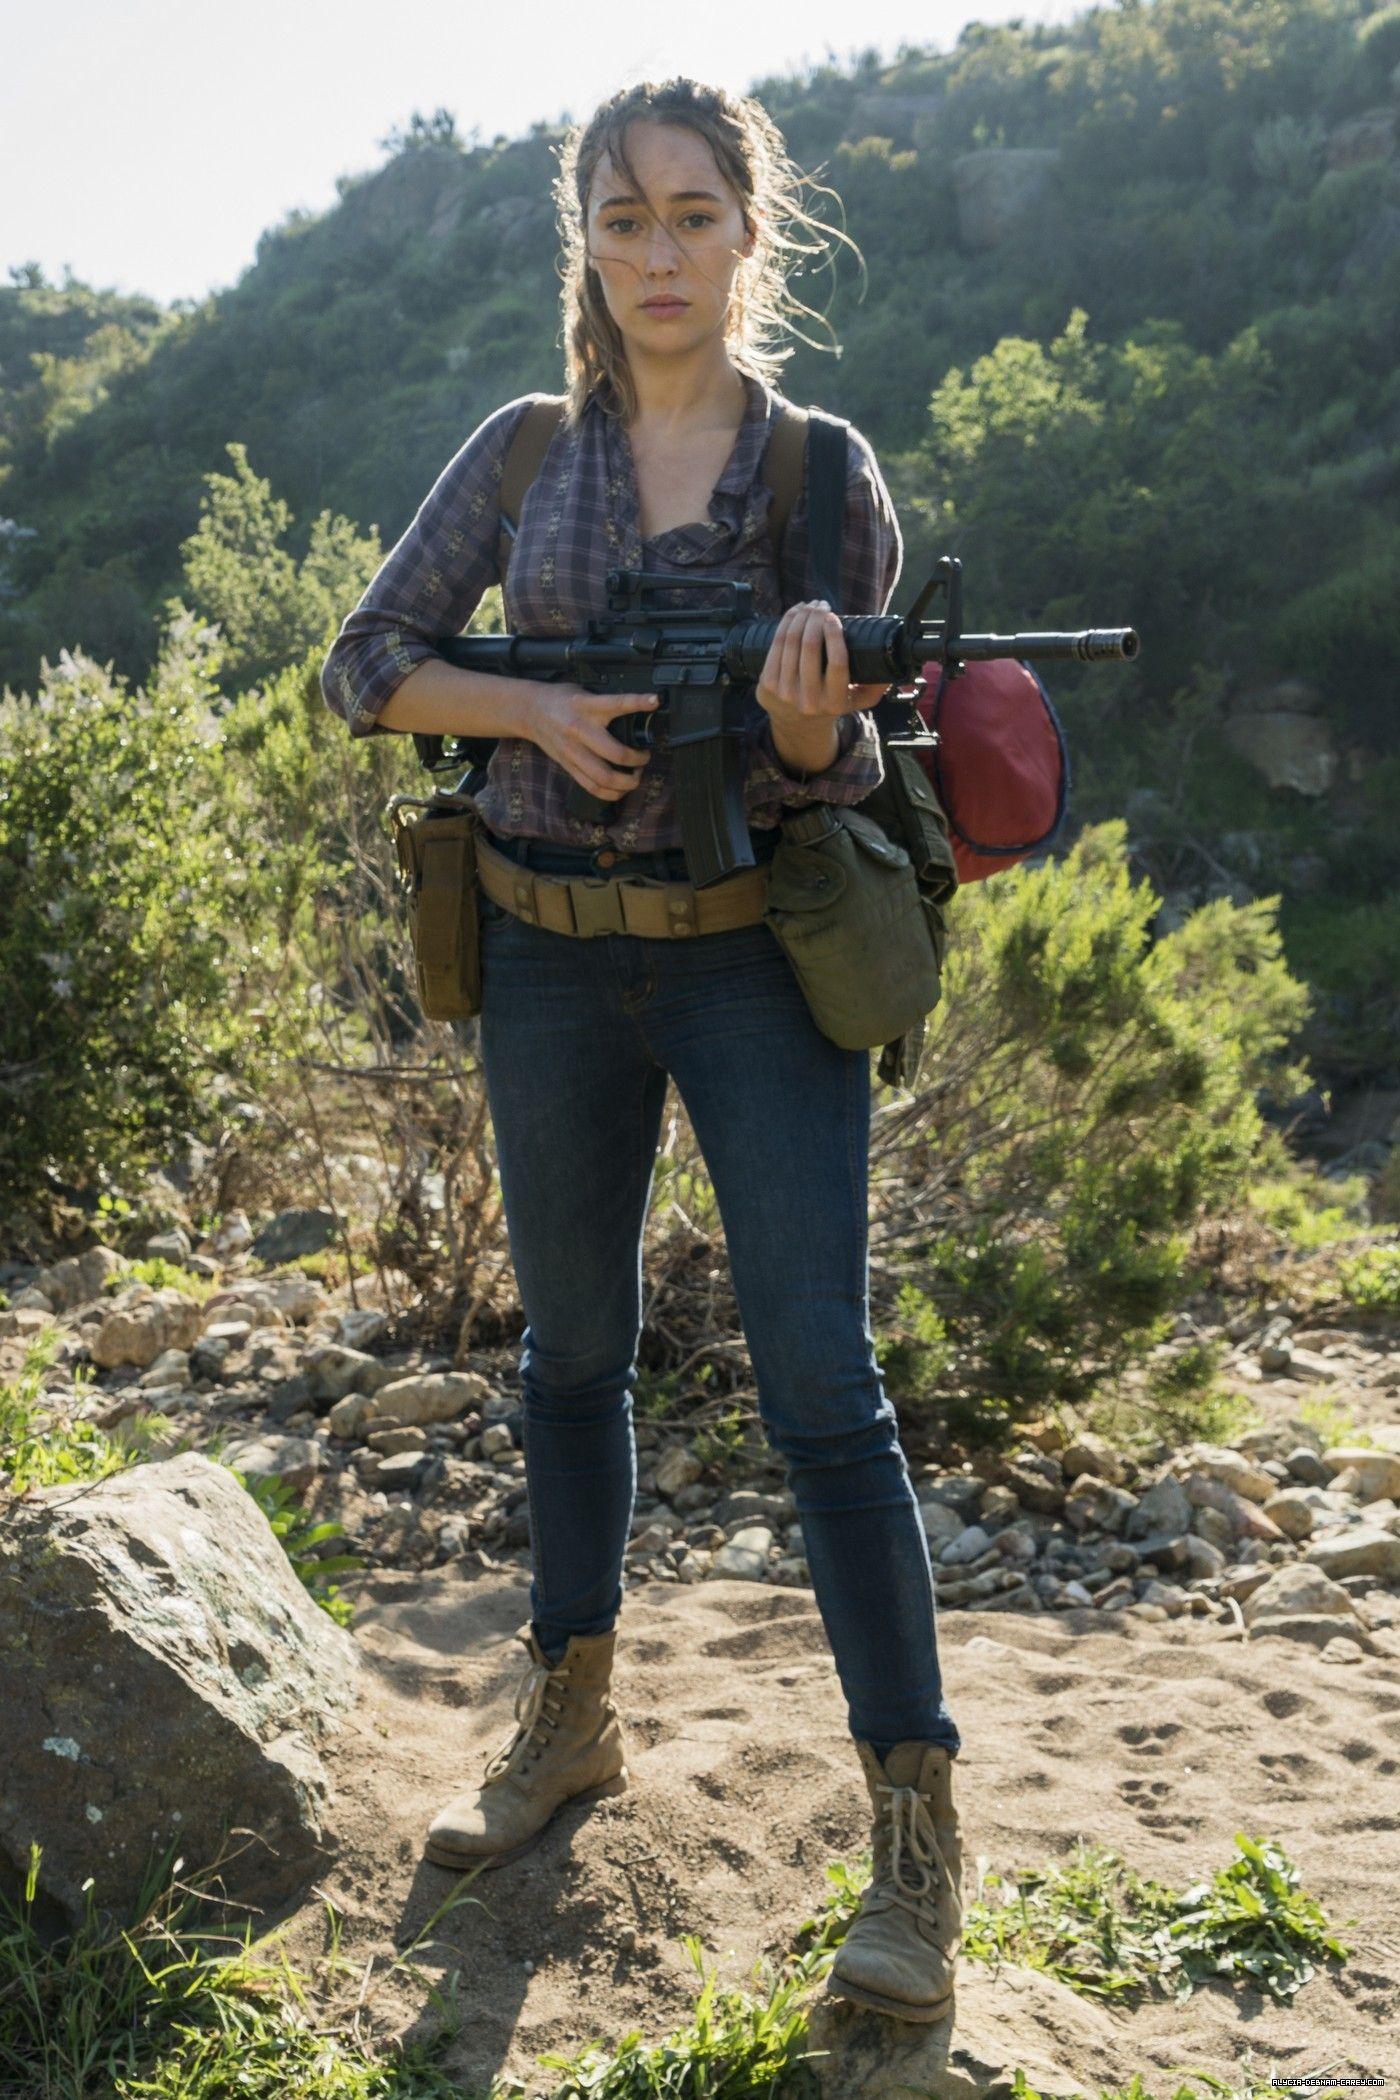 Pin By Jen On Tv Hyper Fixations Fear The Walking Walking Dead Girl Fear The Walking Dead